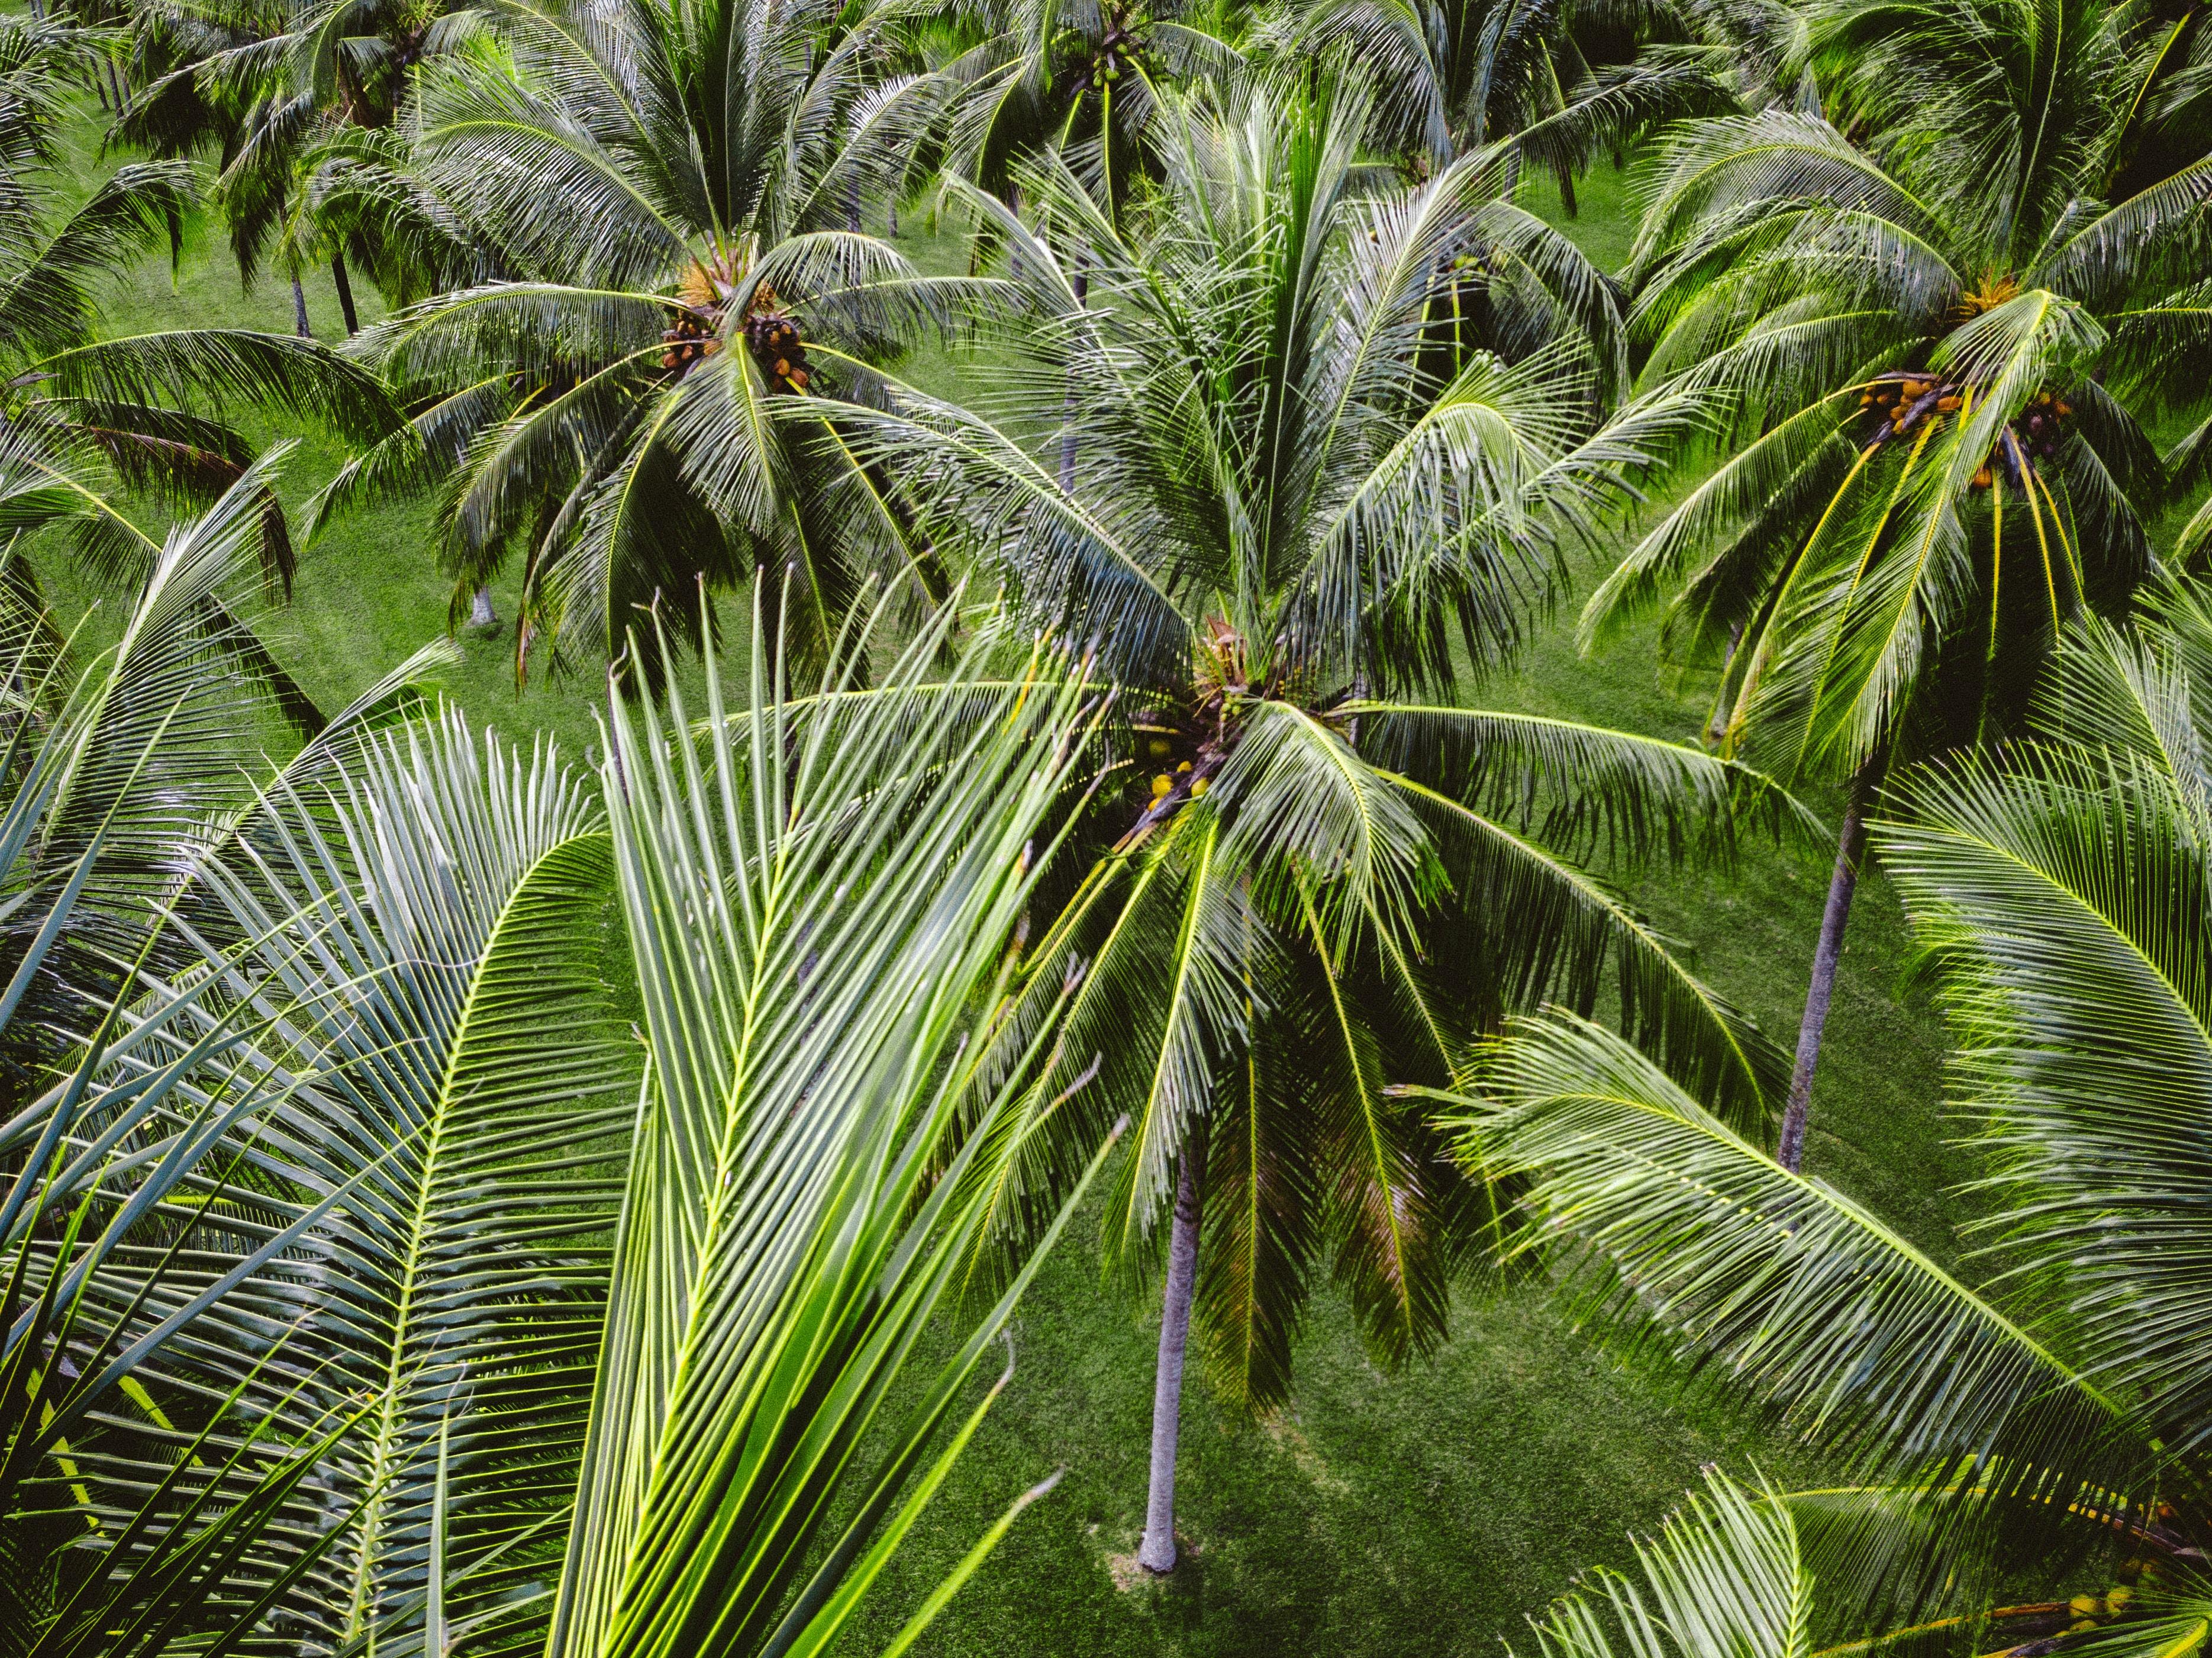 row of coconut trees